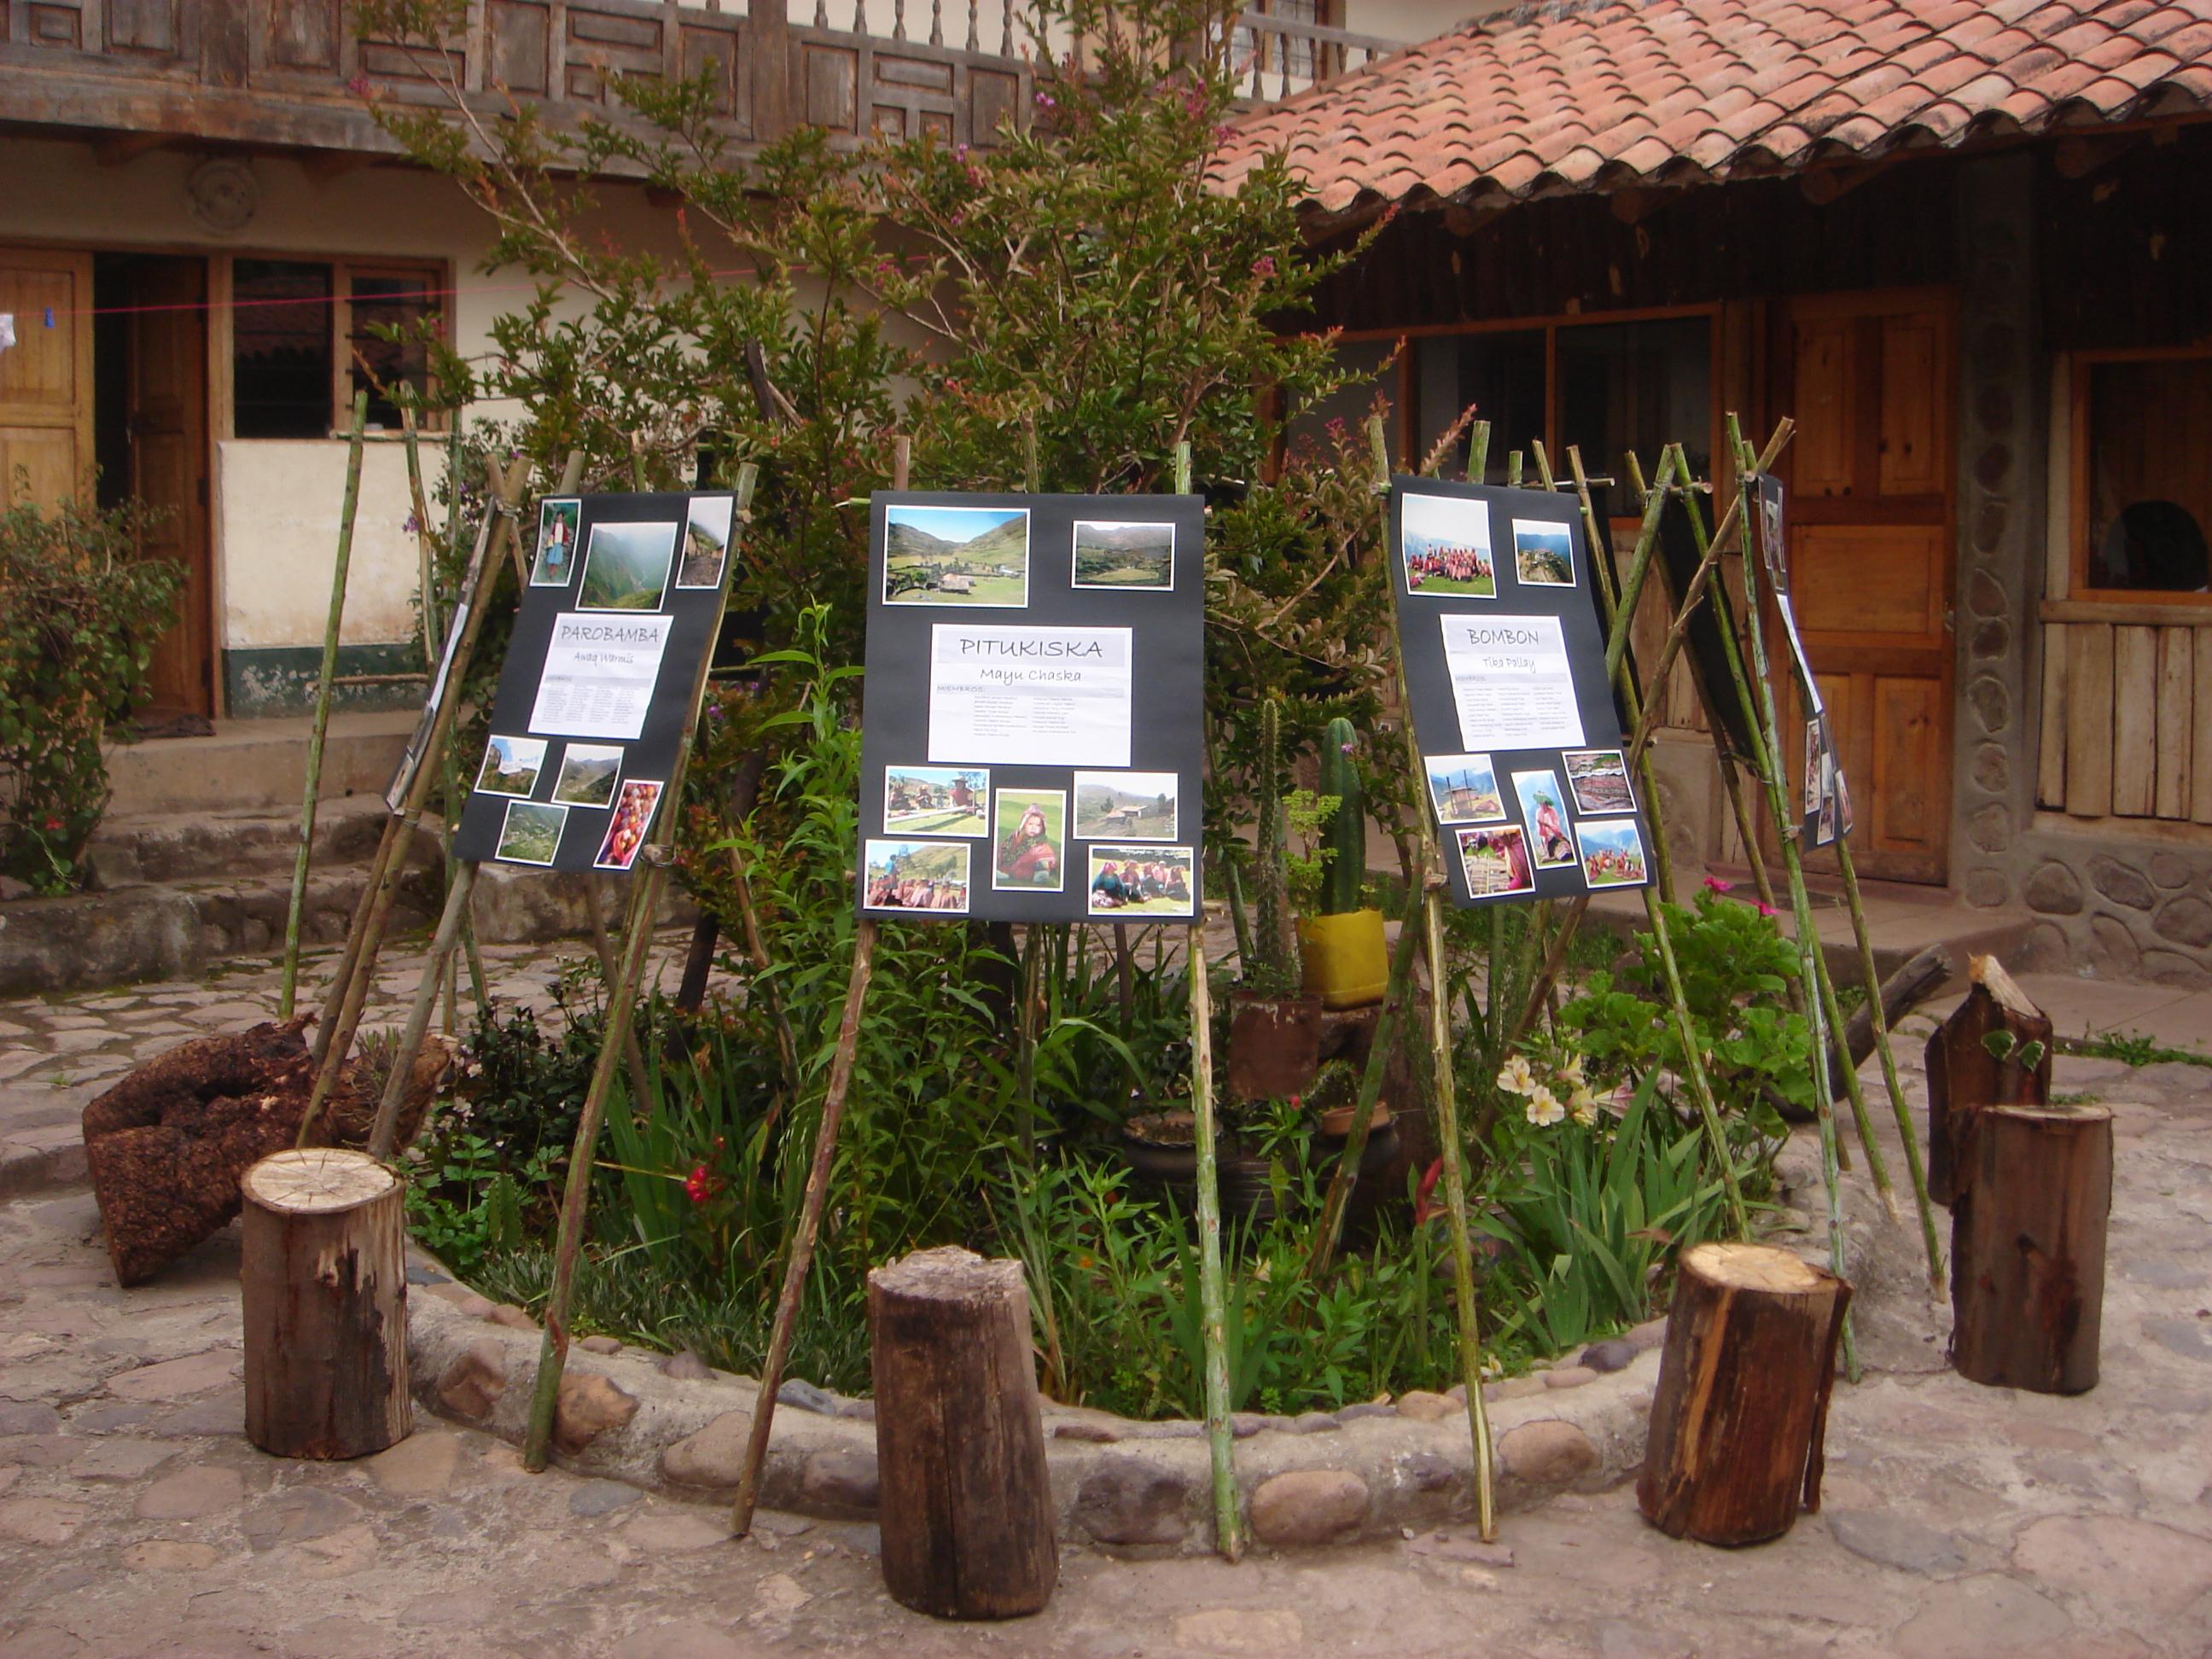 Community representation displays